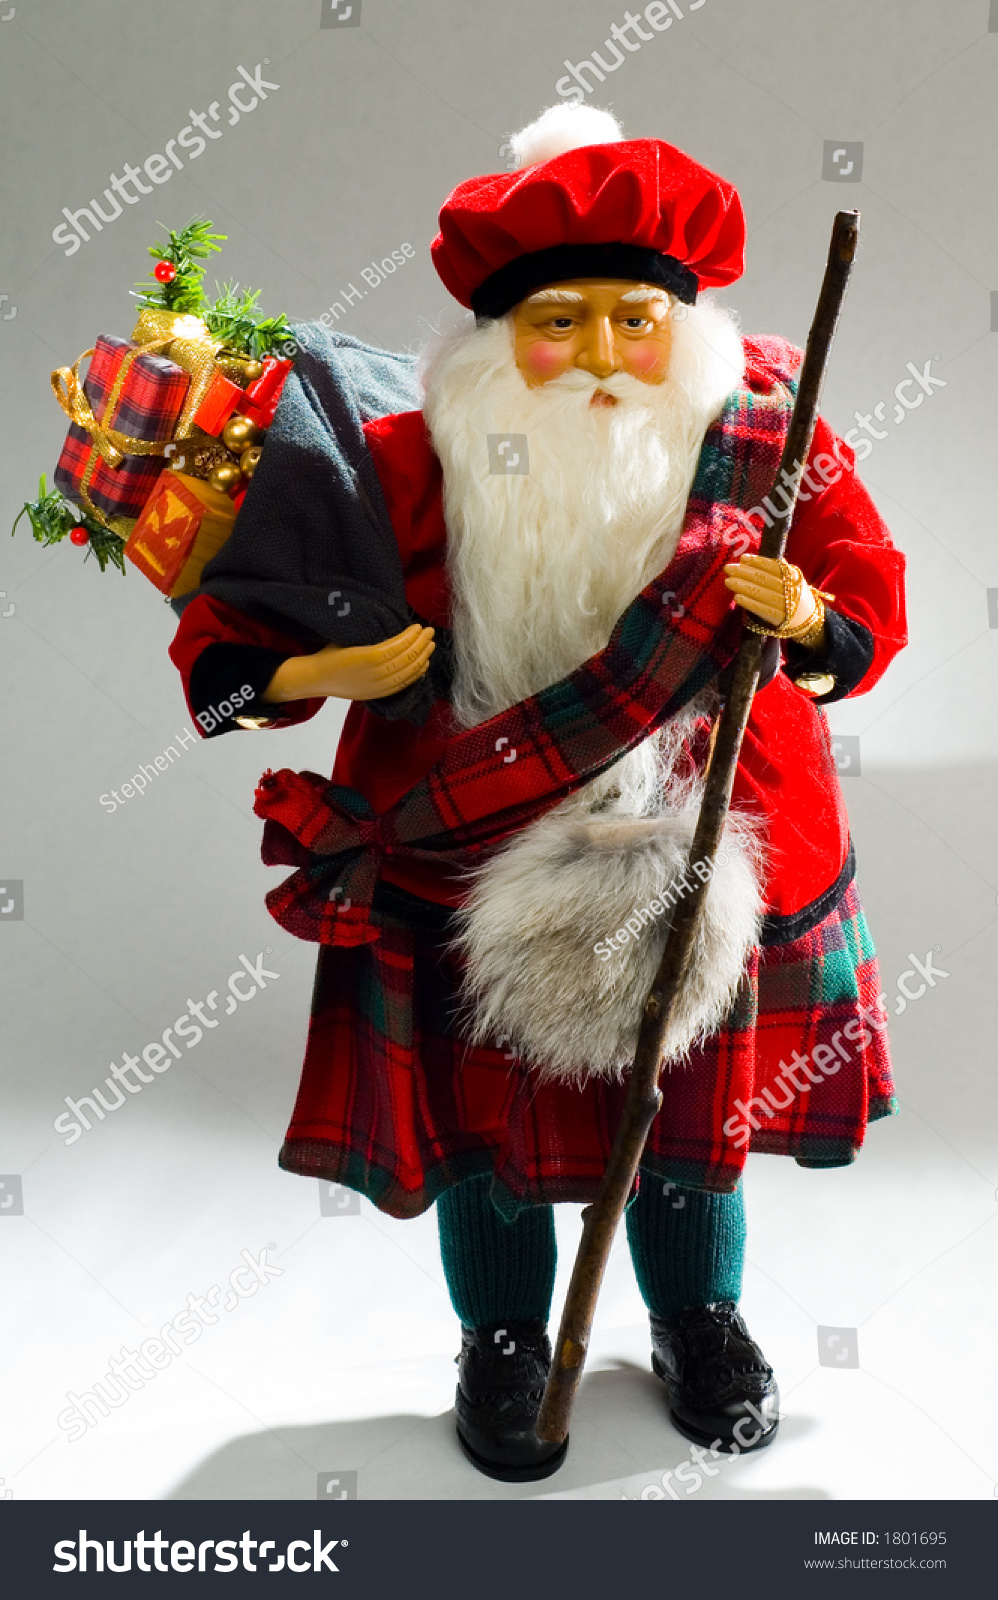 Scottish Santa Claus Toy Bag Day Stock Photo 1801695